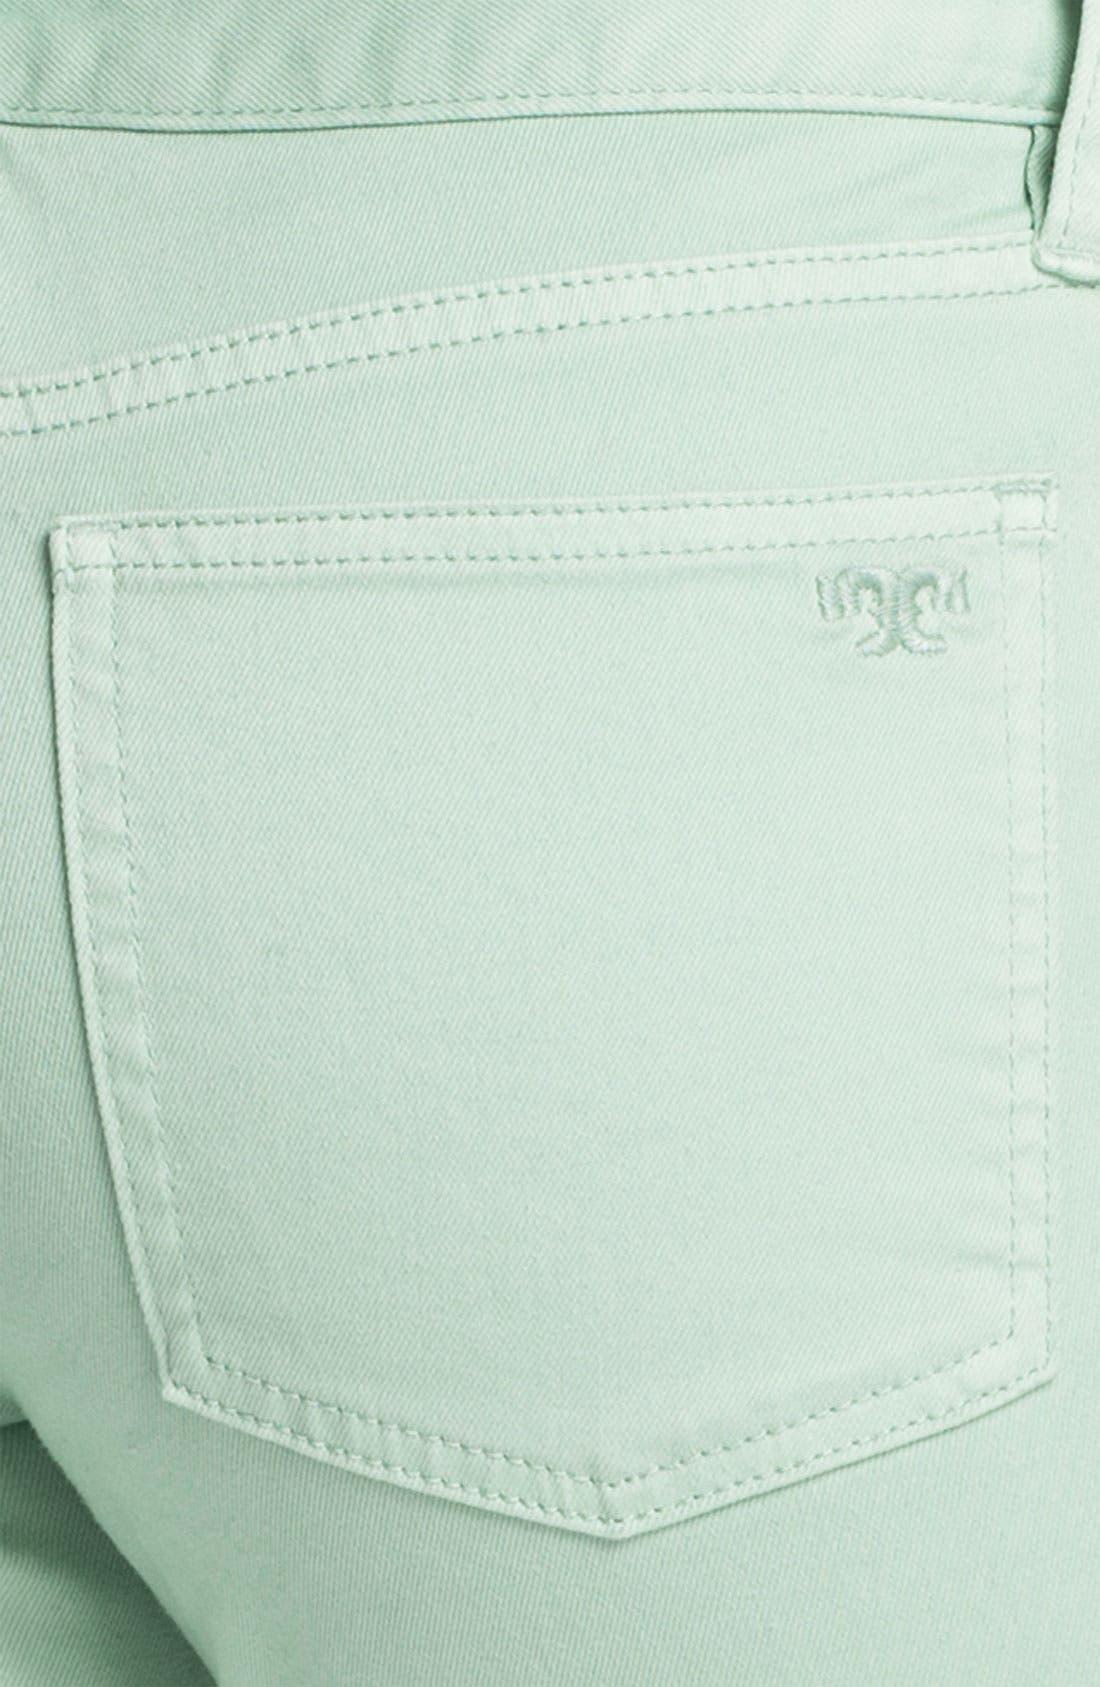 Alternate Image 3  - Tory Burch 'Alexa' Crop Skinny Stretch Jeans (Seaglass)